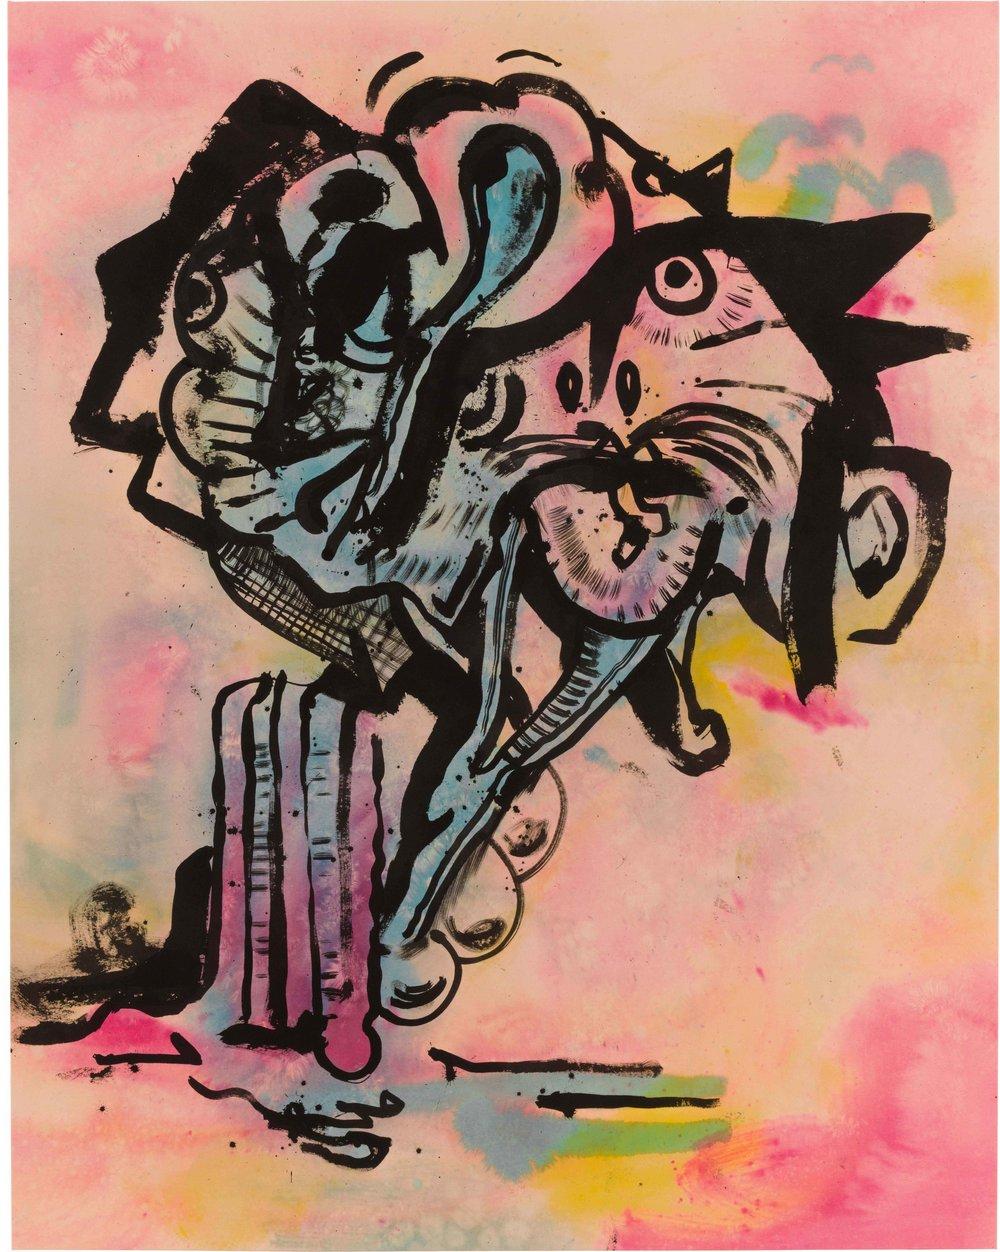 Drew Beattie  Dmitri Martin  2014 acrylic on canvas 96 x 76 inches